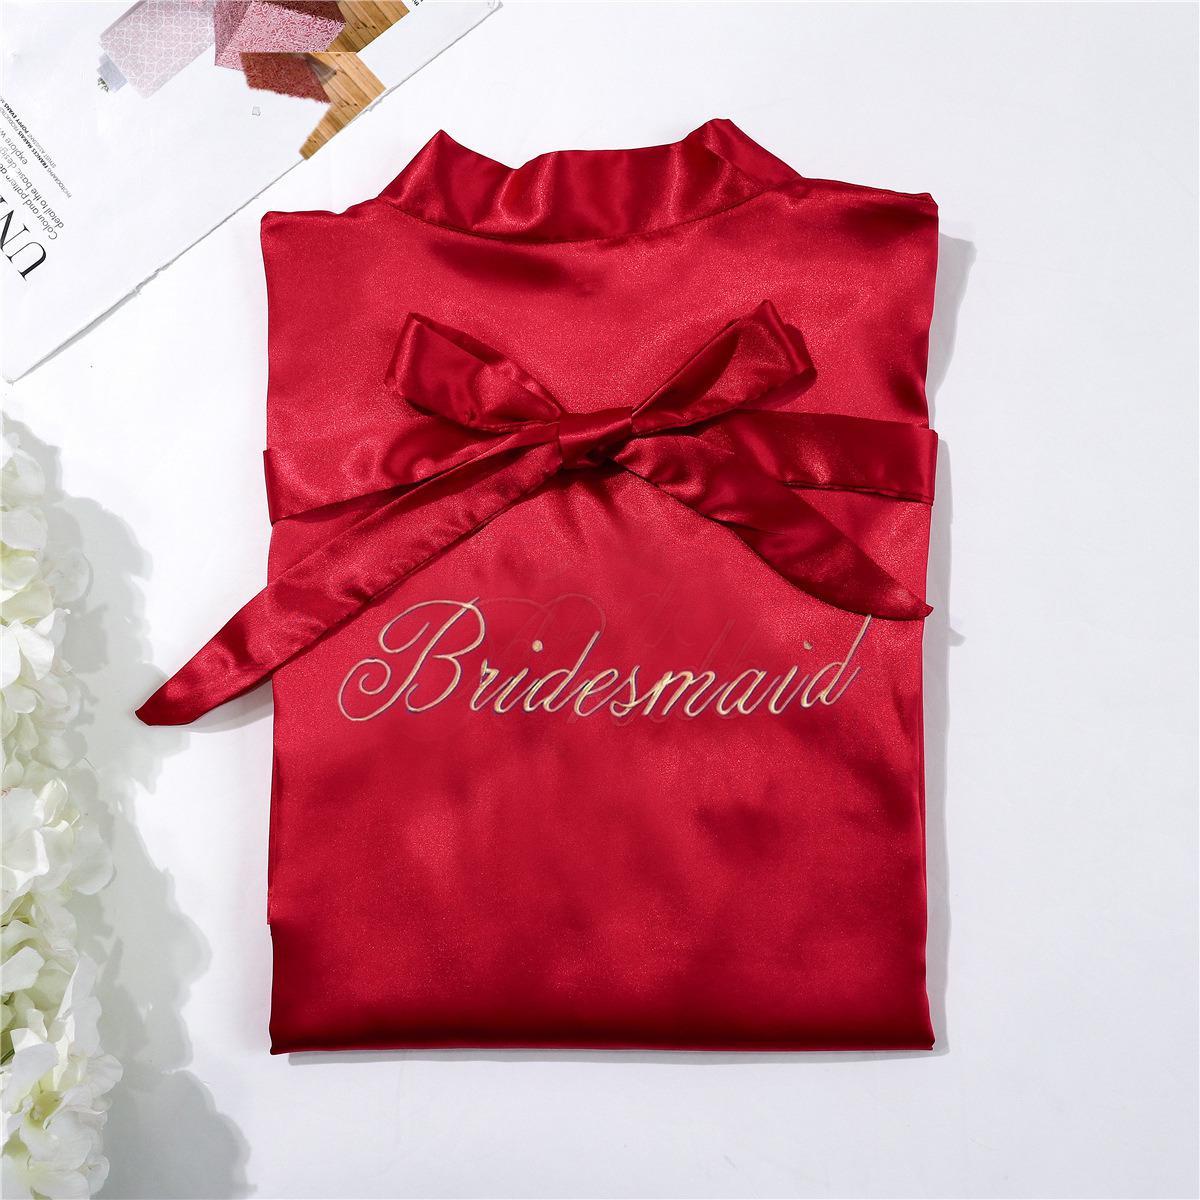 Bridesmaid - 5